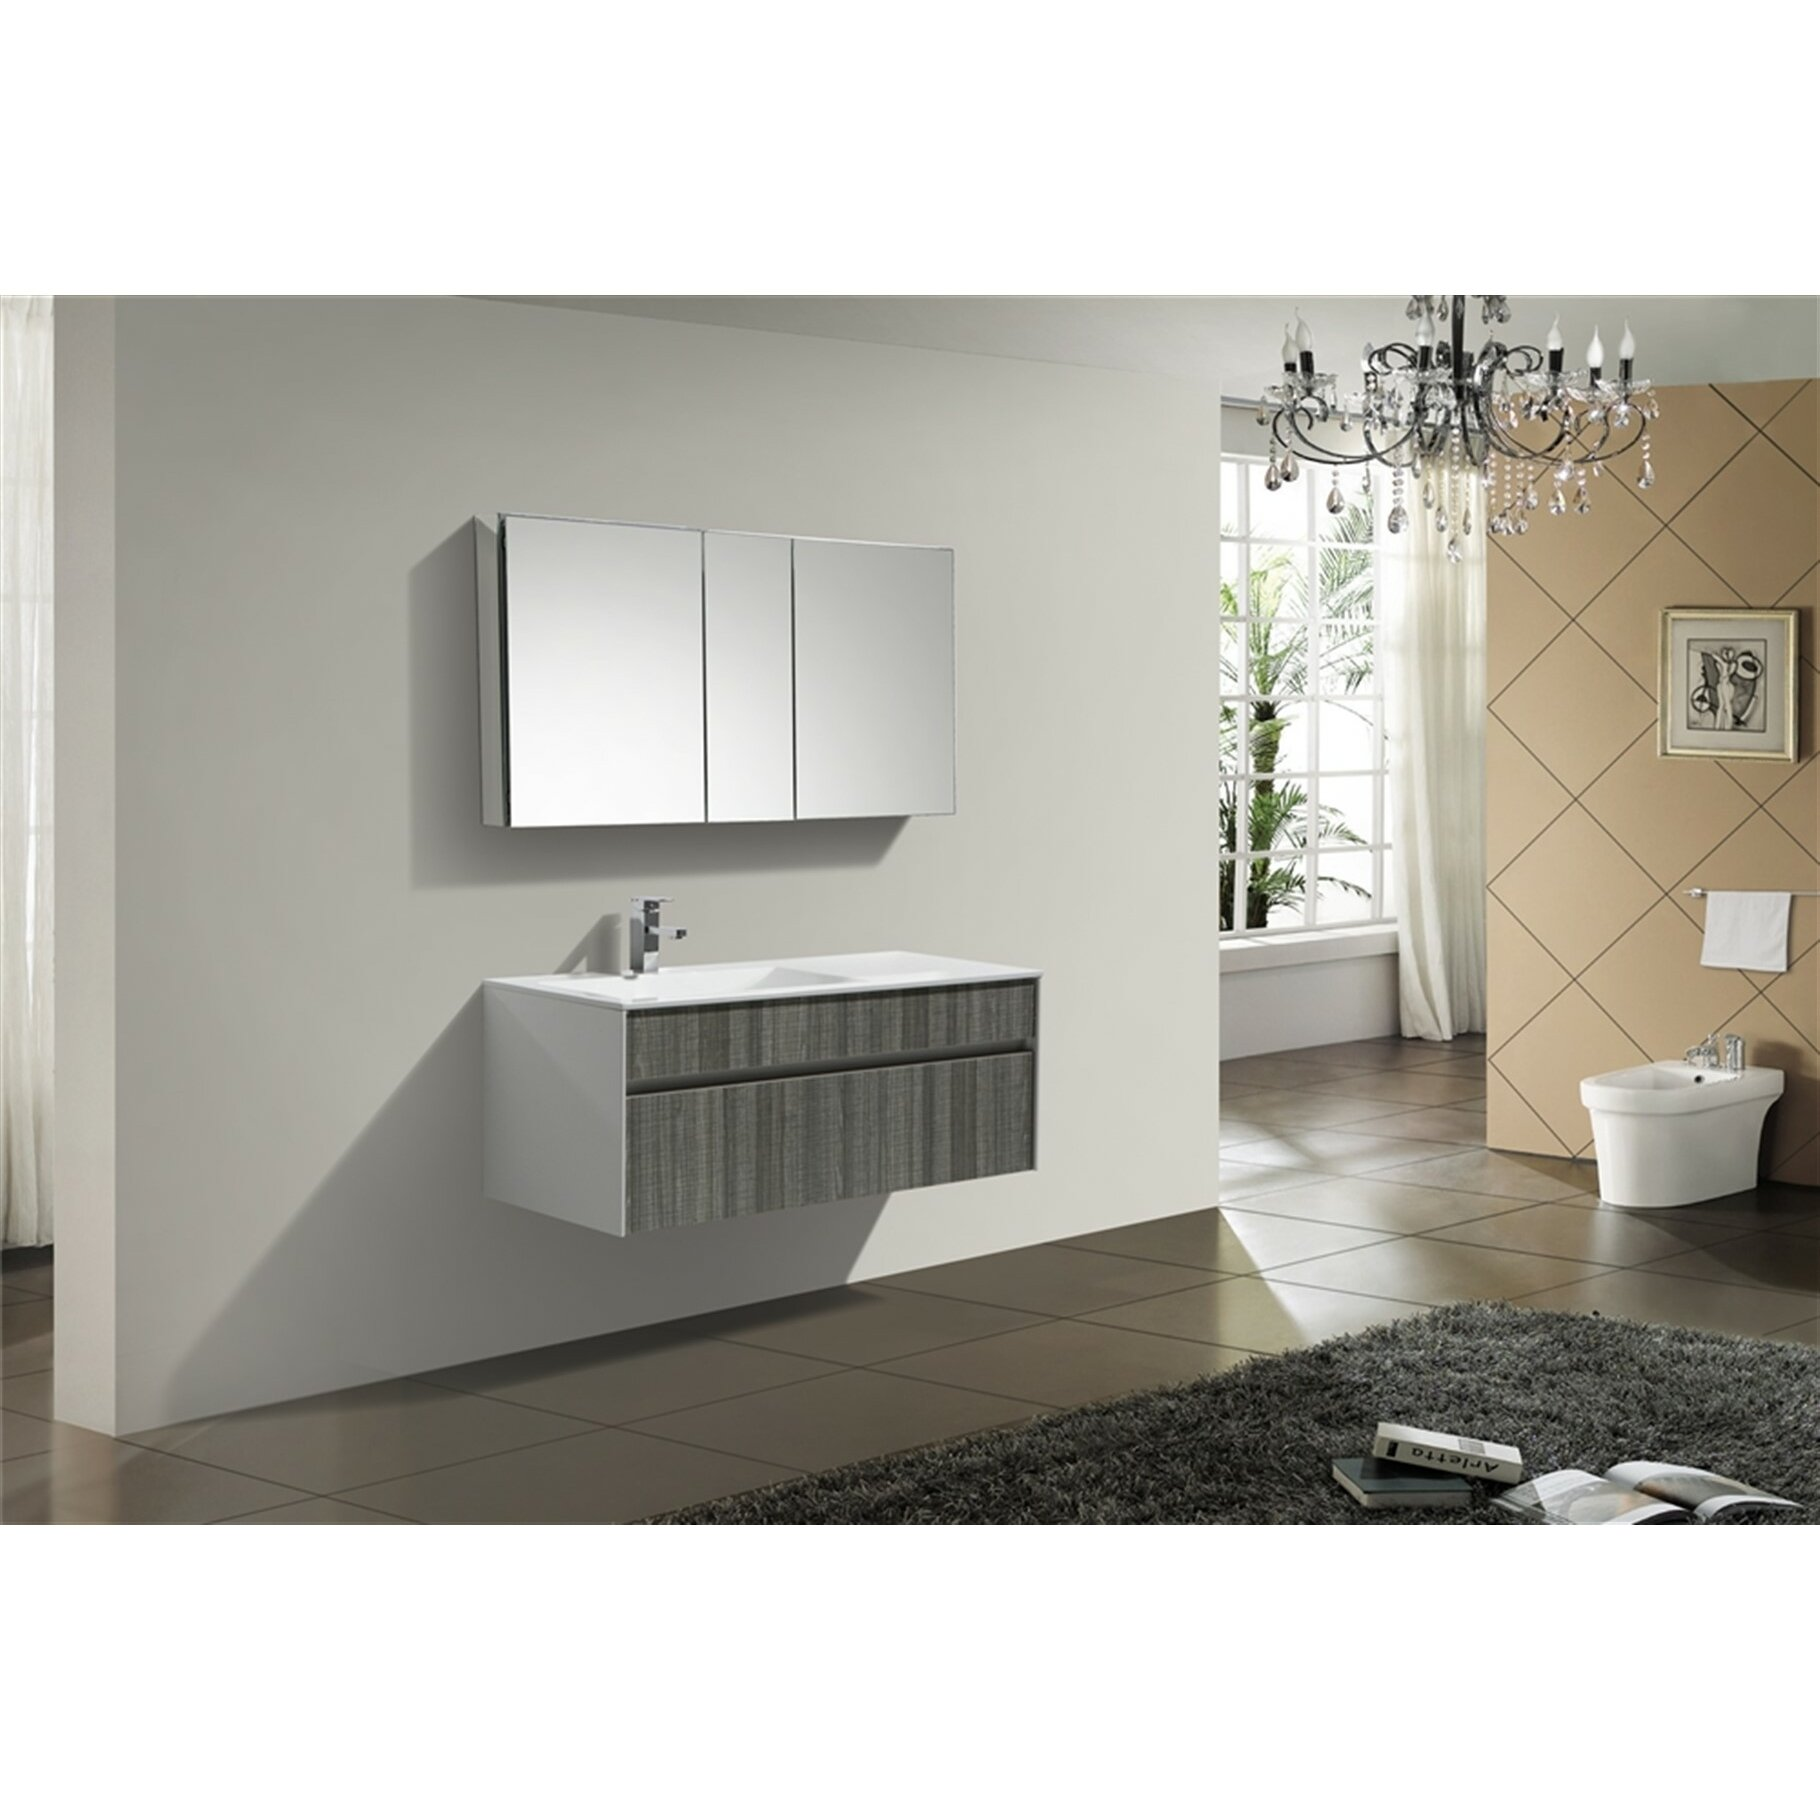 kube bath fitto 48 single modern bathroom vanity set reviews wayfair. Black Bedroom Furniture Sets. Home Design Ideas